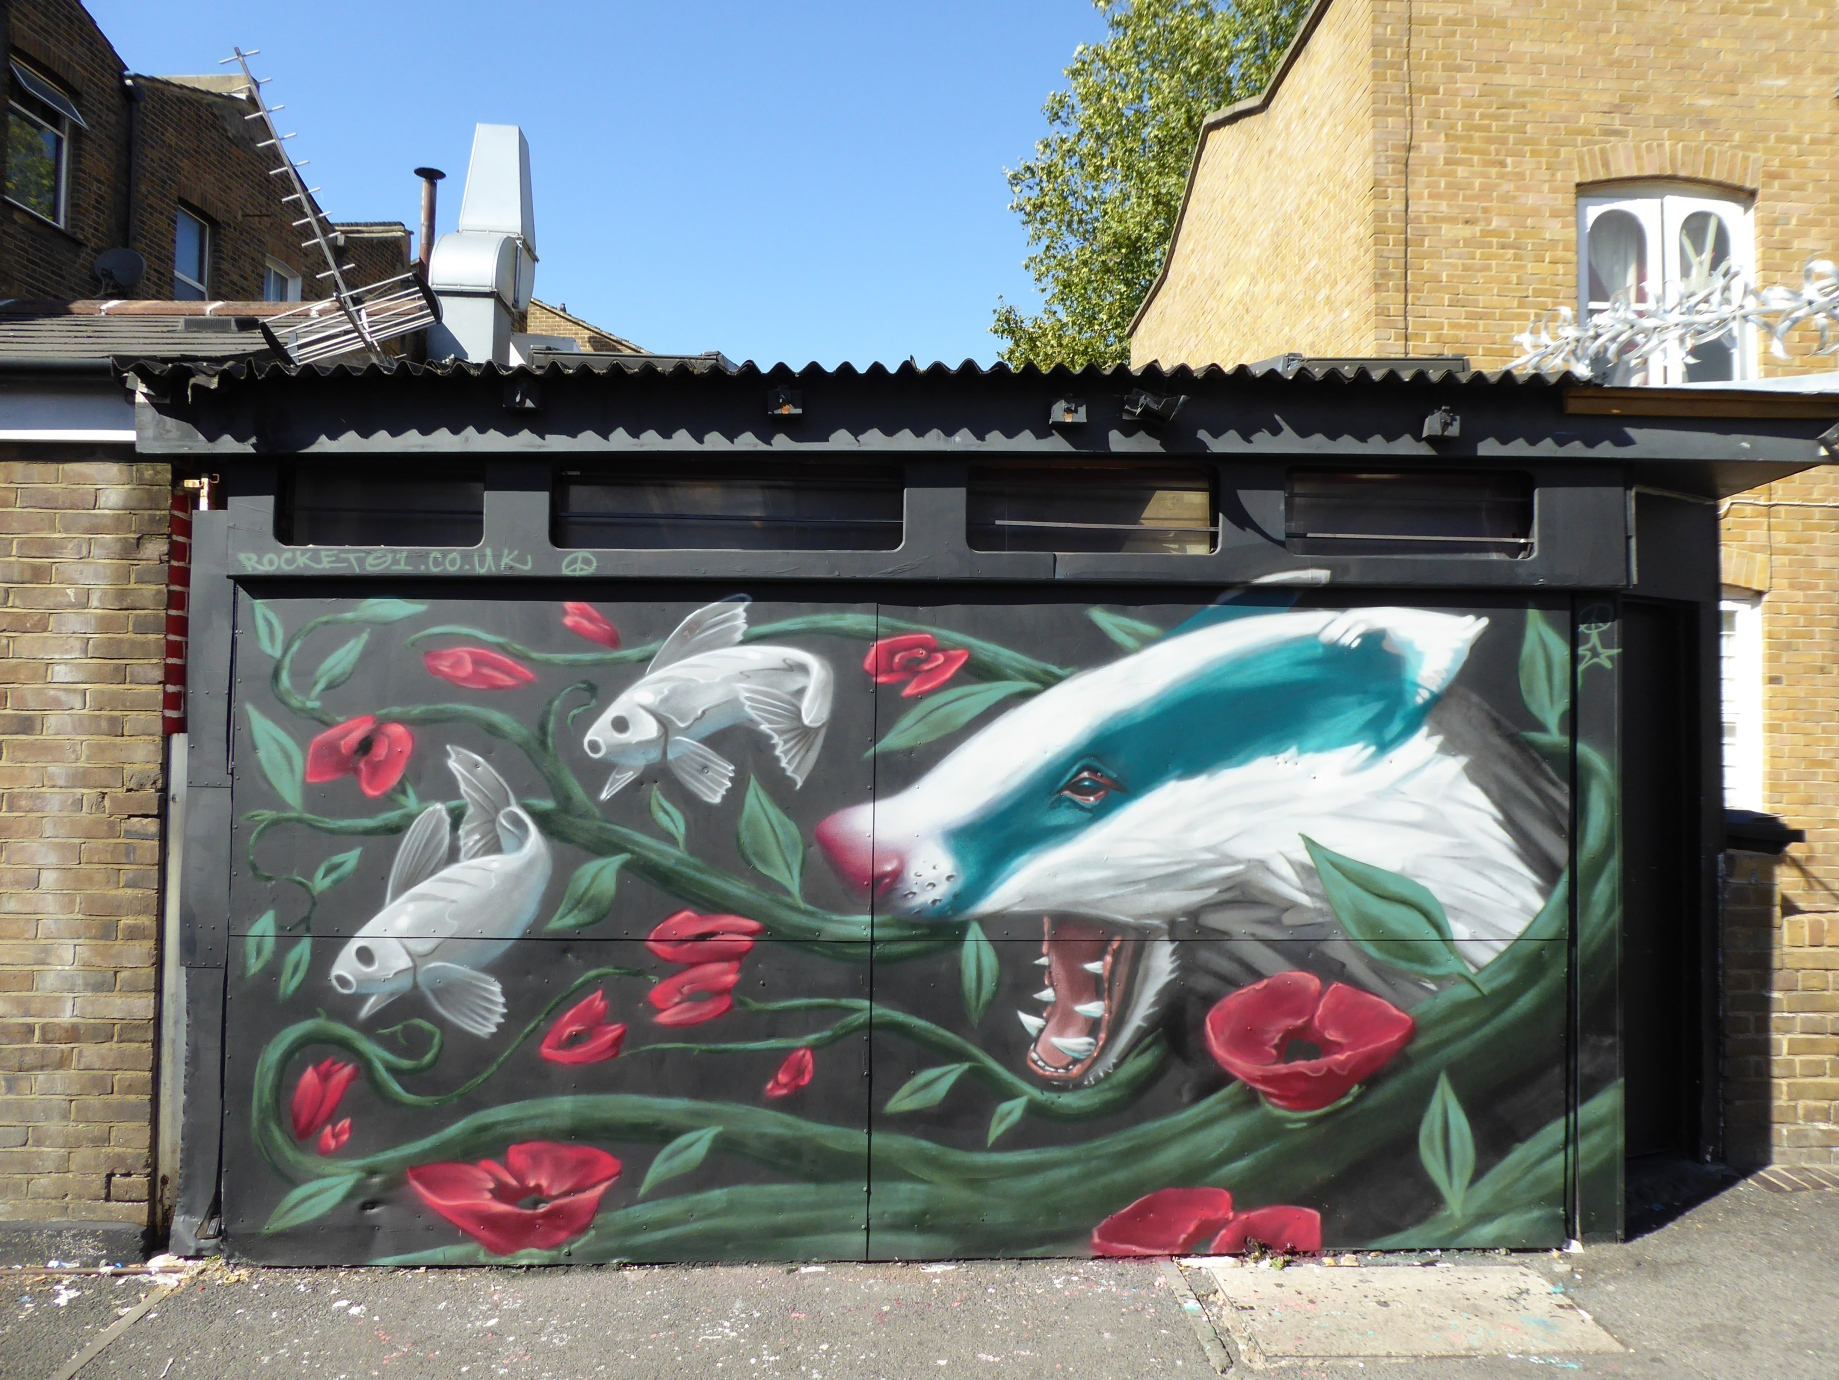 2018 a year of street art graffiti in london